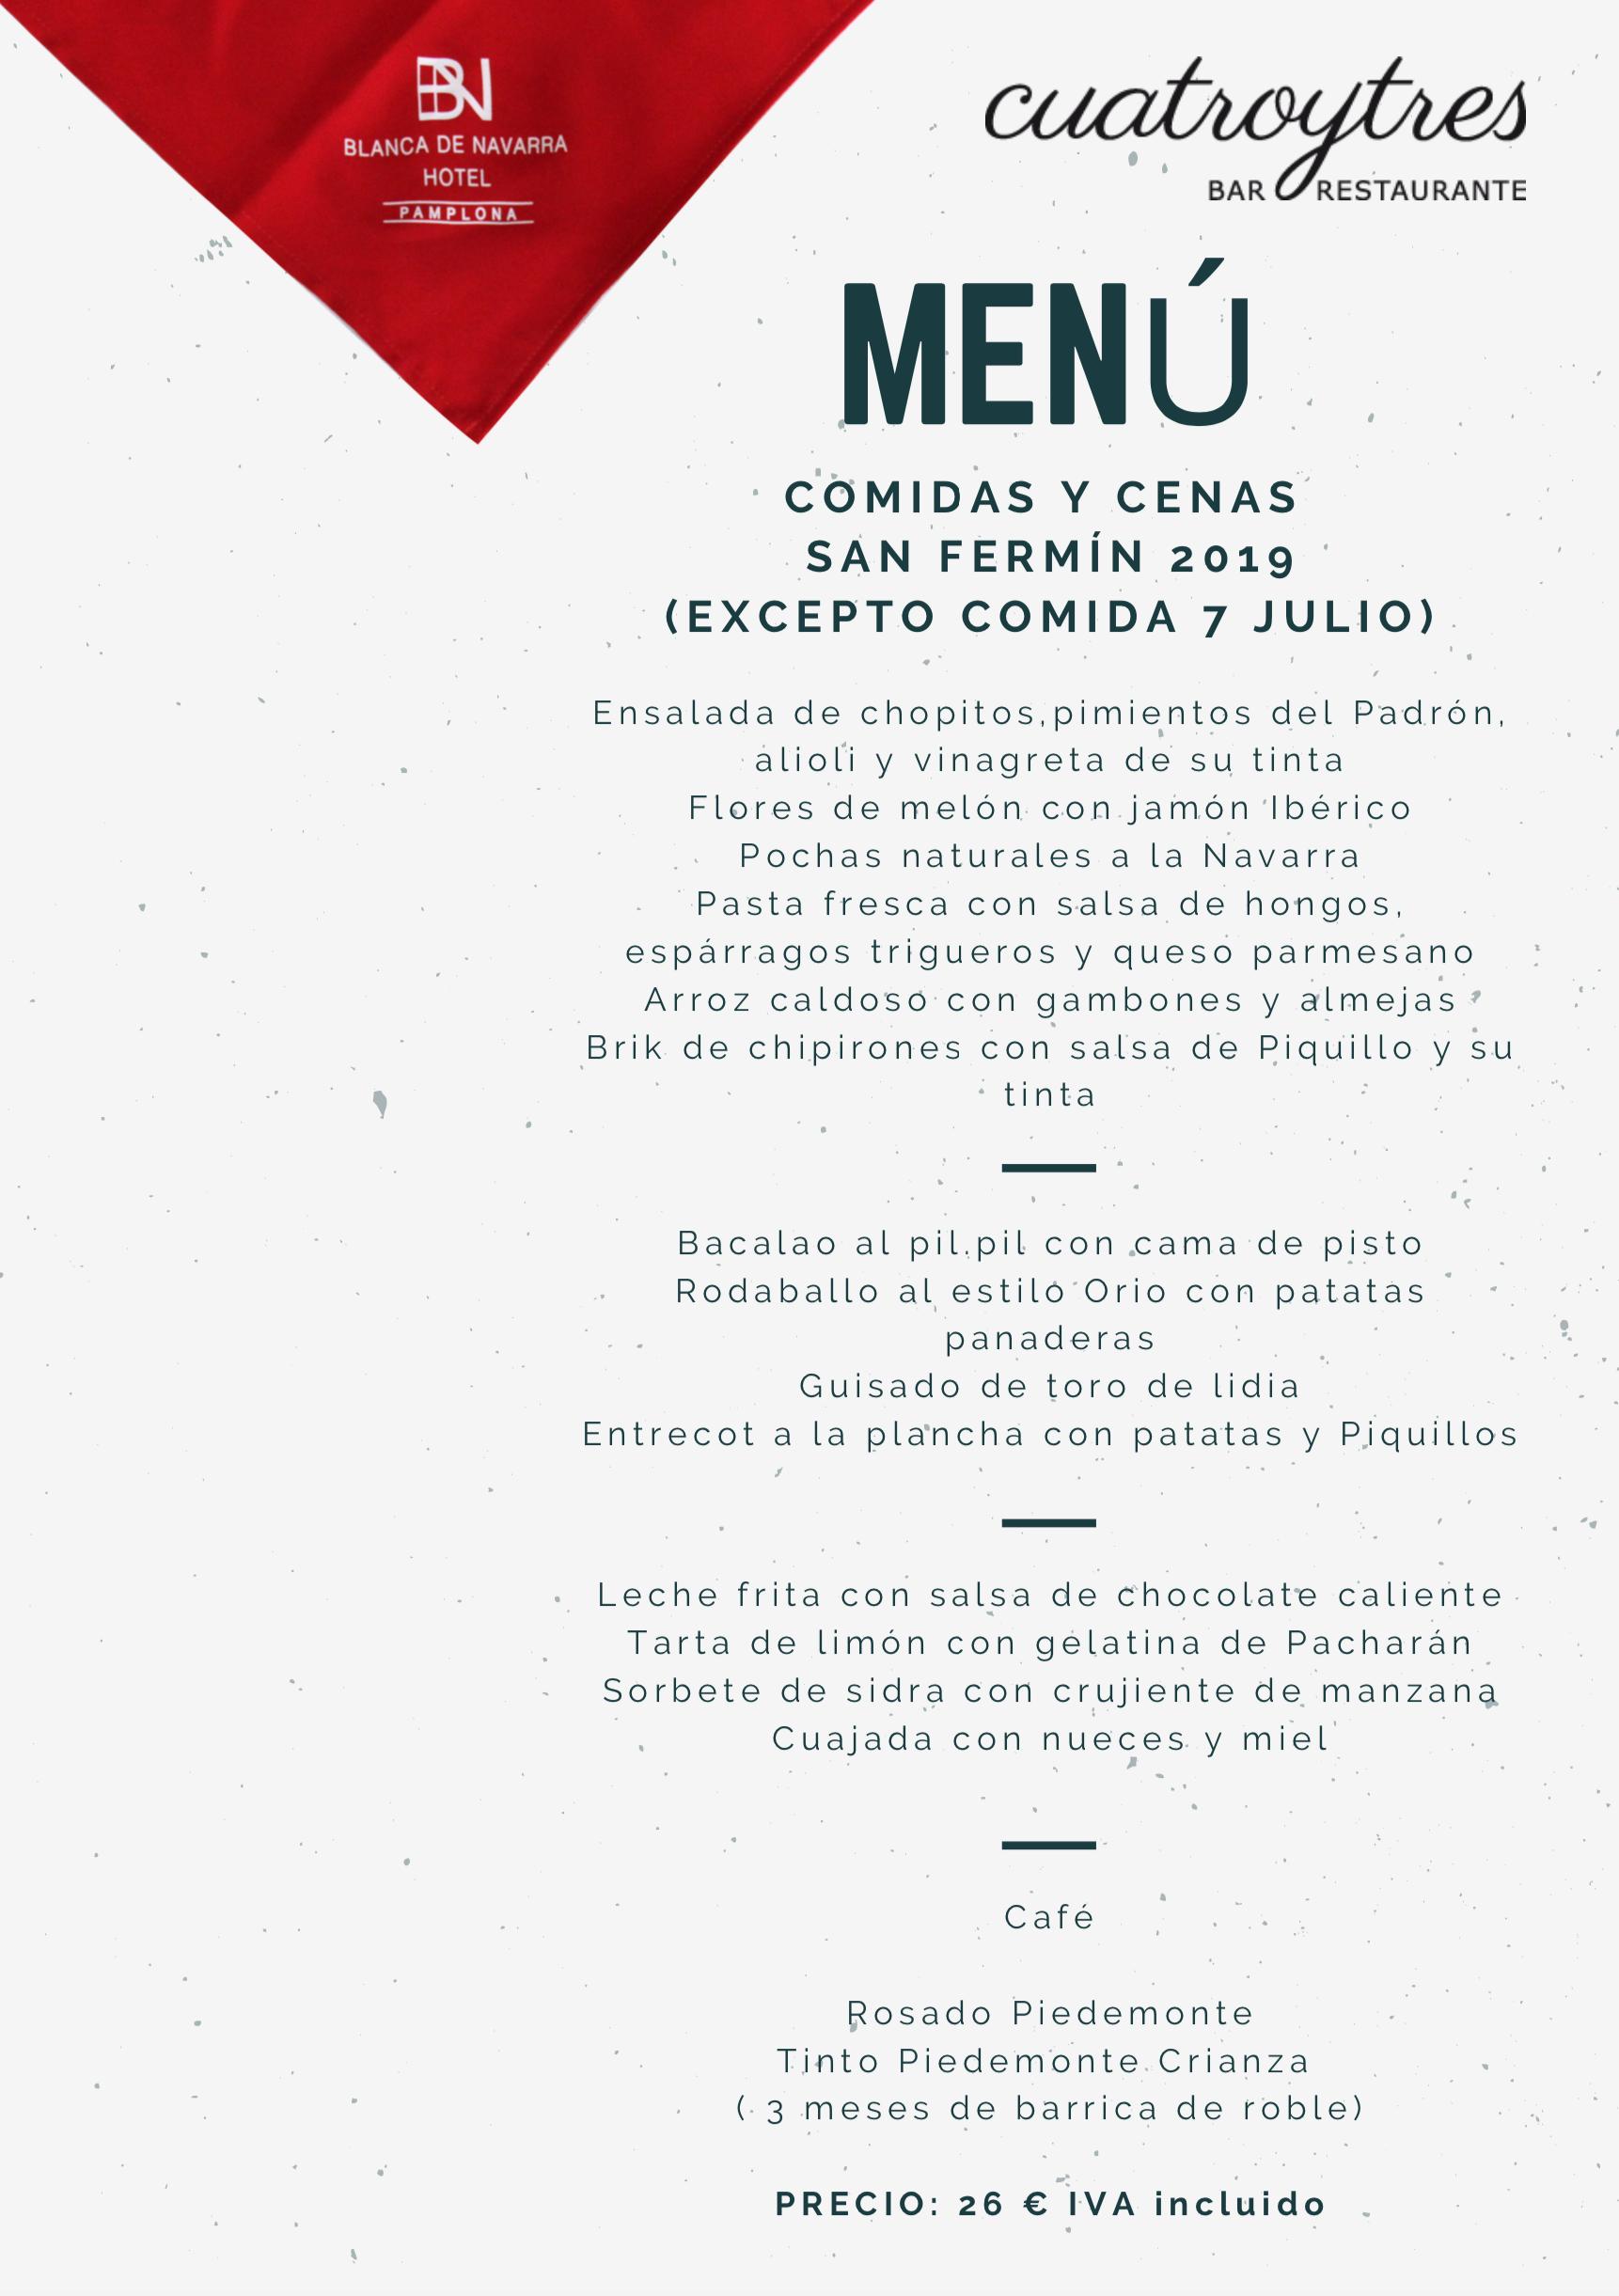 menus-sf-hbn